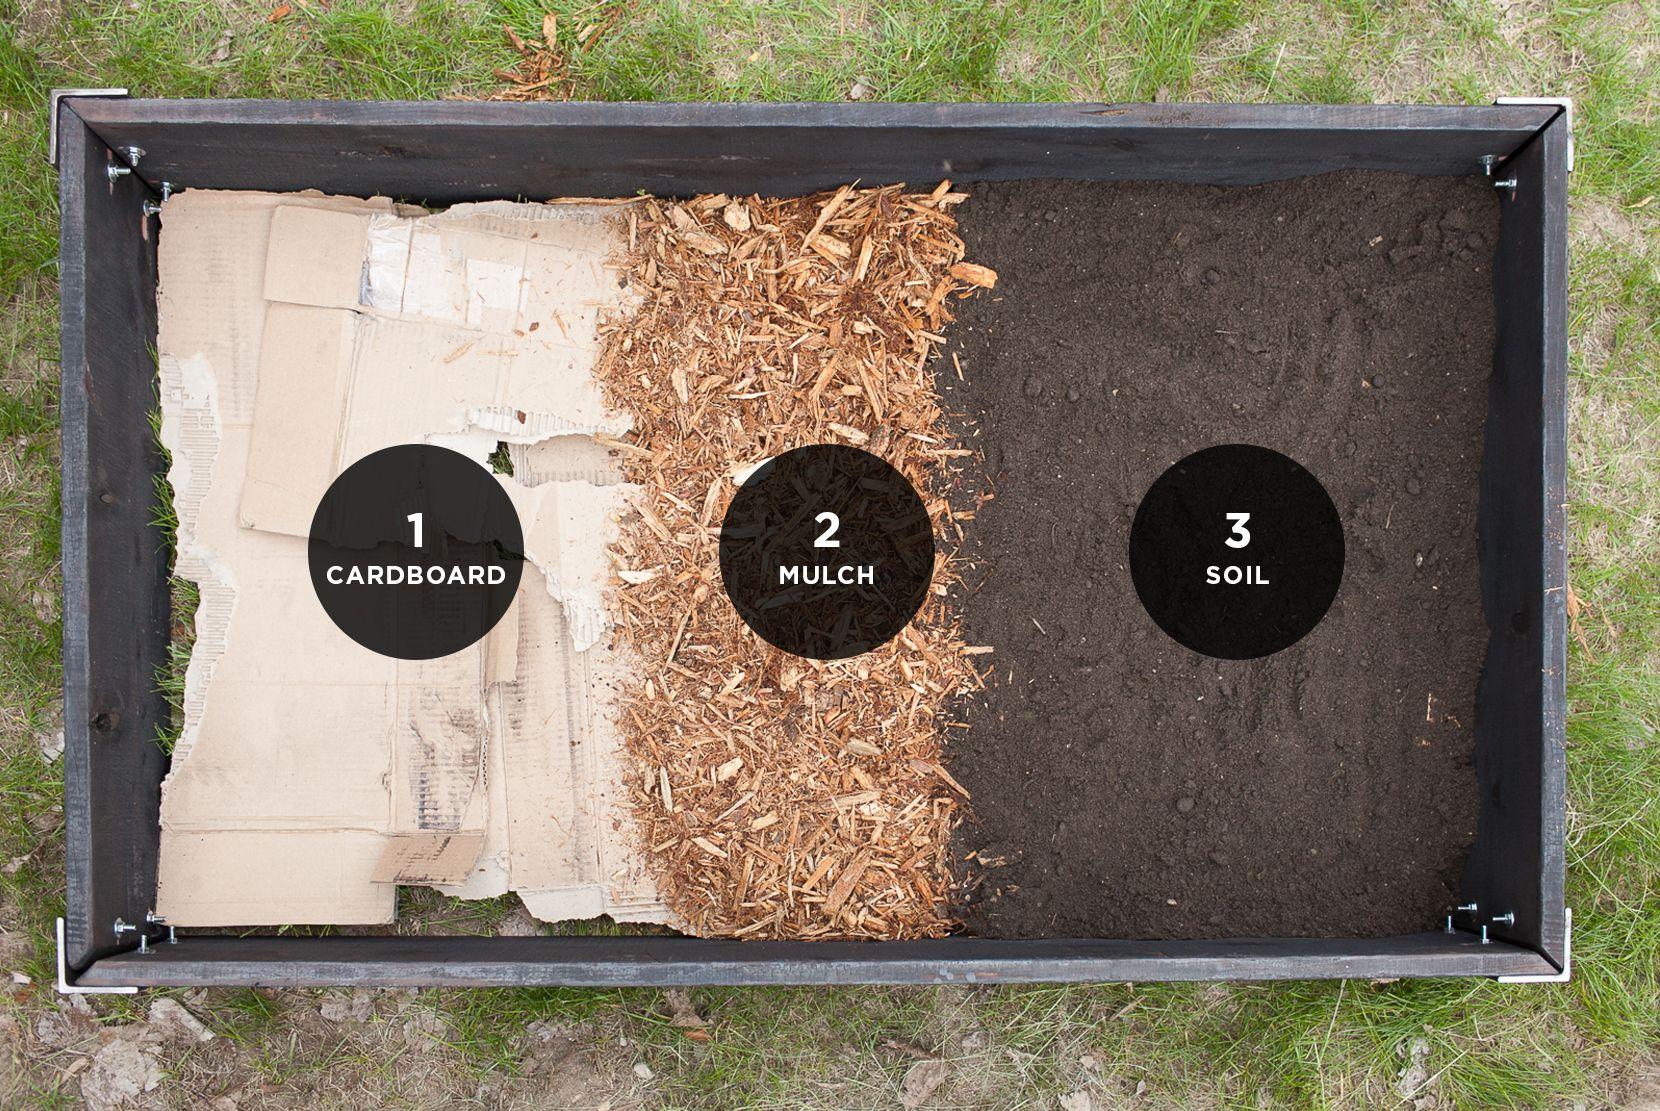 hight resolution of raised garden bed layers the fresh exchange cardboard mulch soil